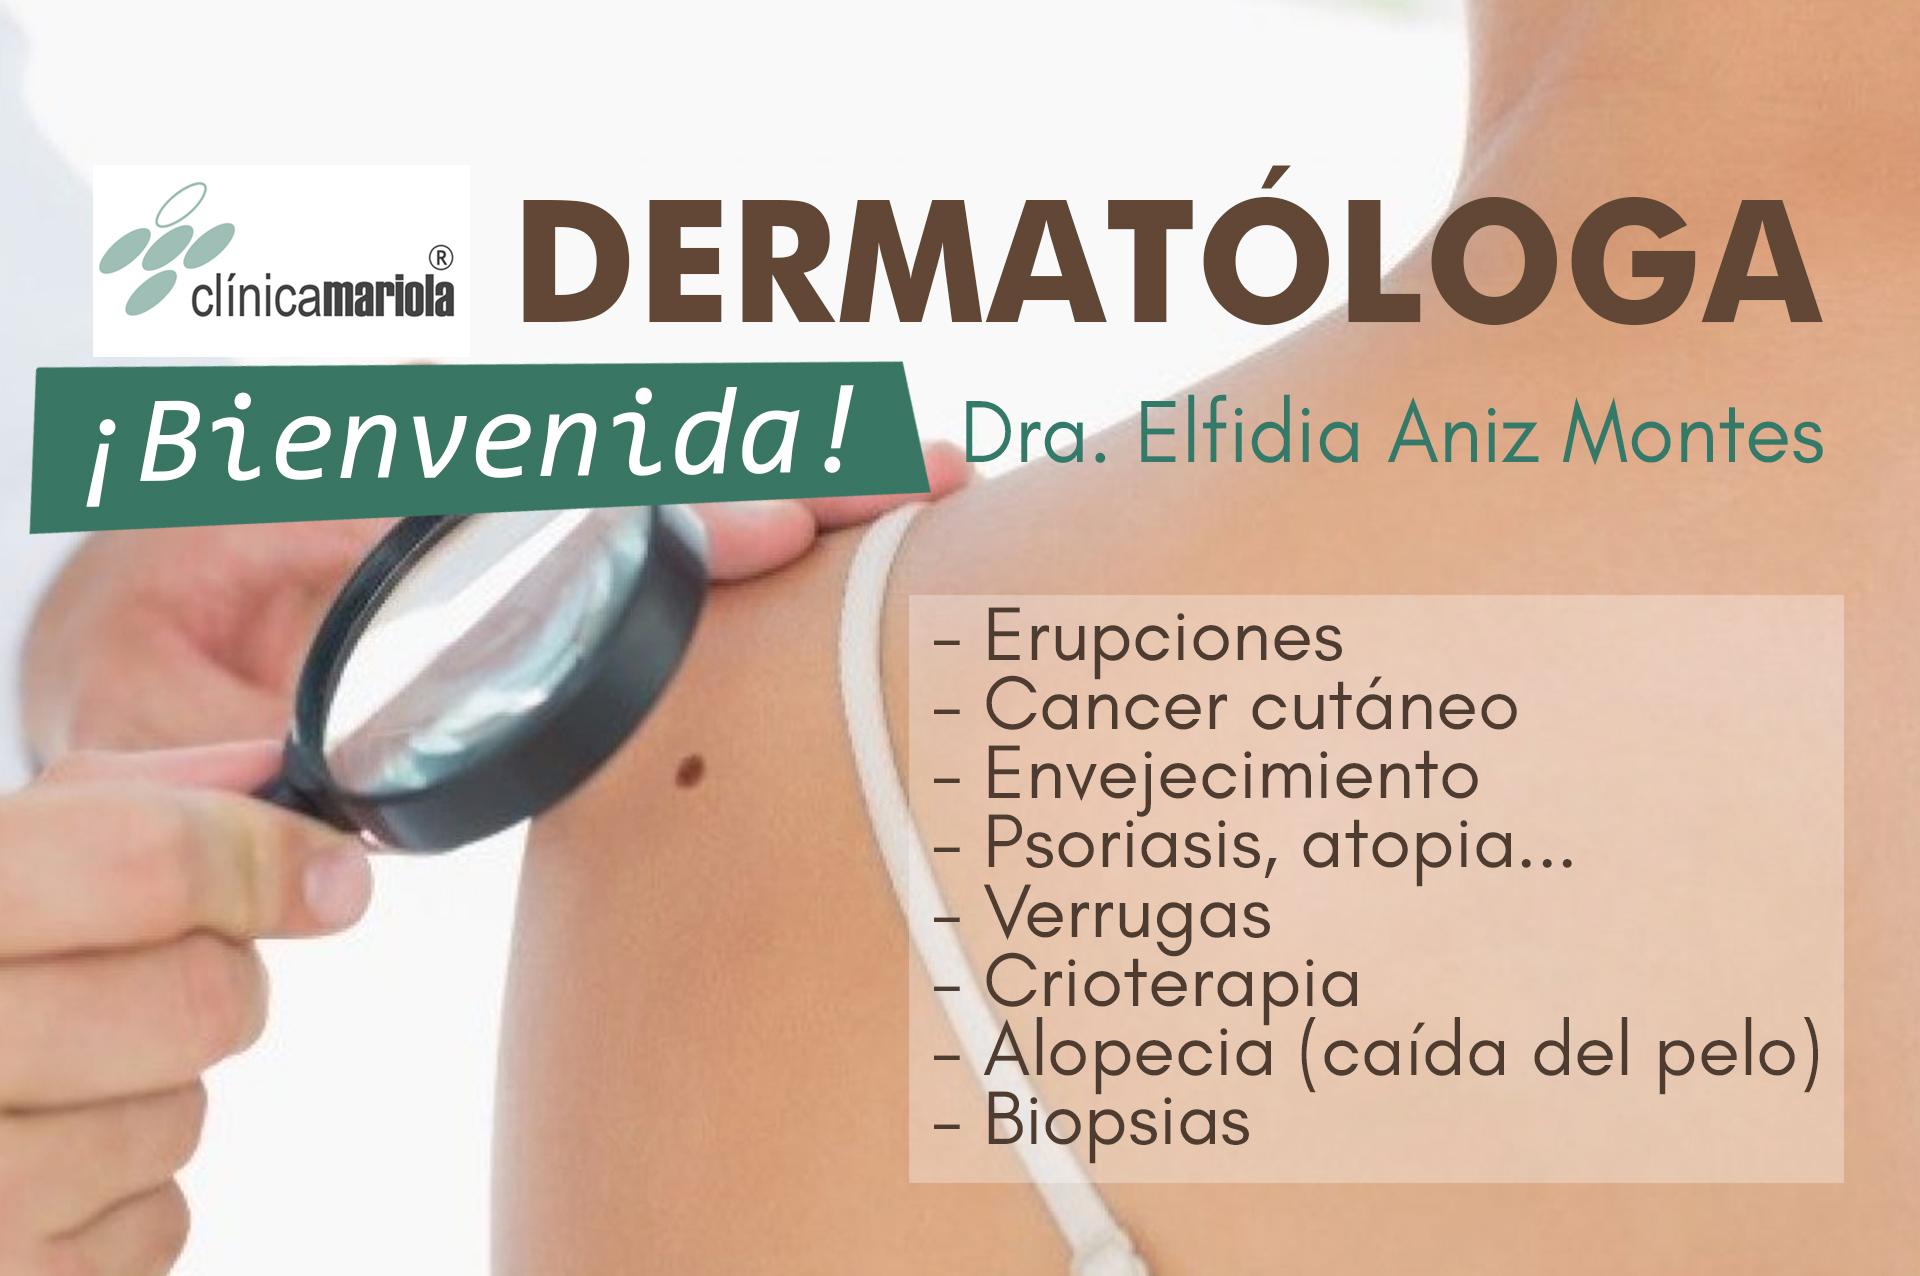 dermatologo en Alcoy Ibi Ontinyent Onteniente Albaida Castalla dermatologia elfidia aniz